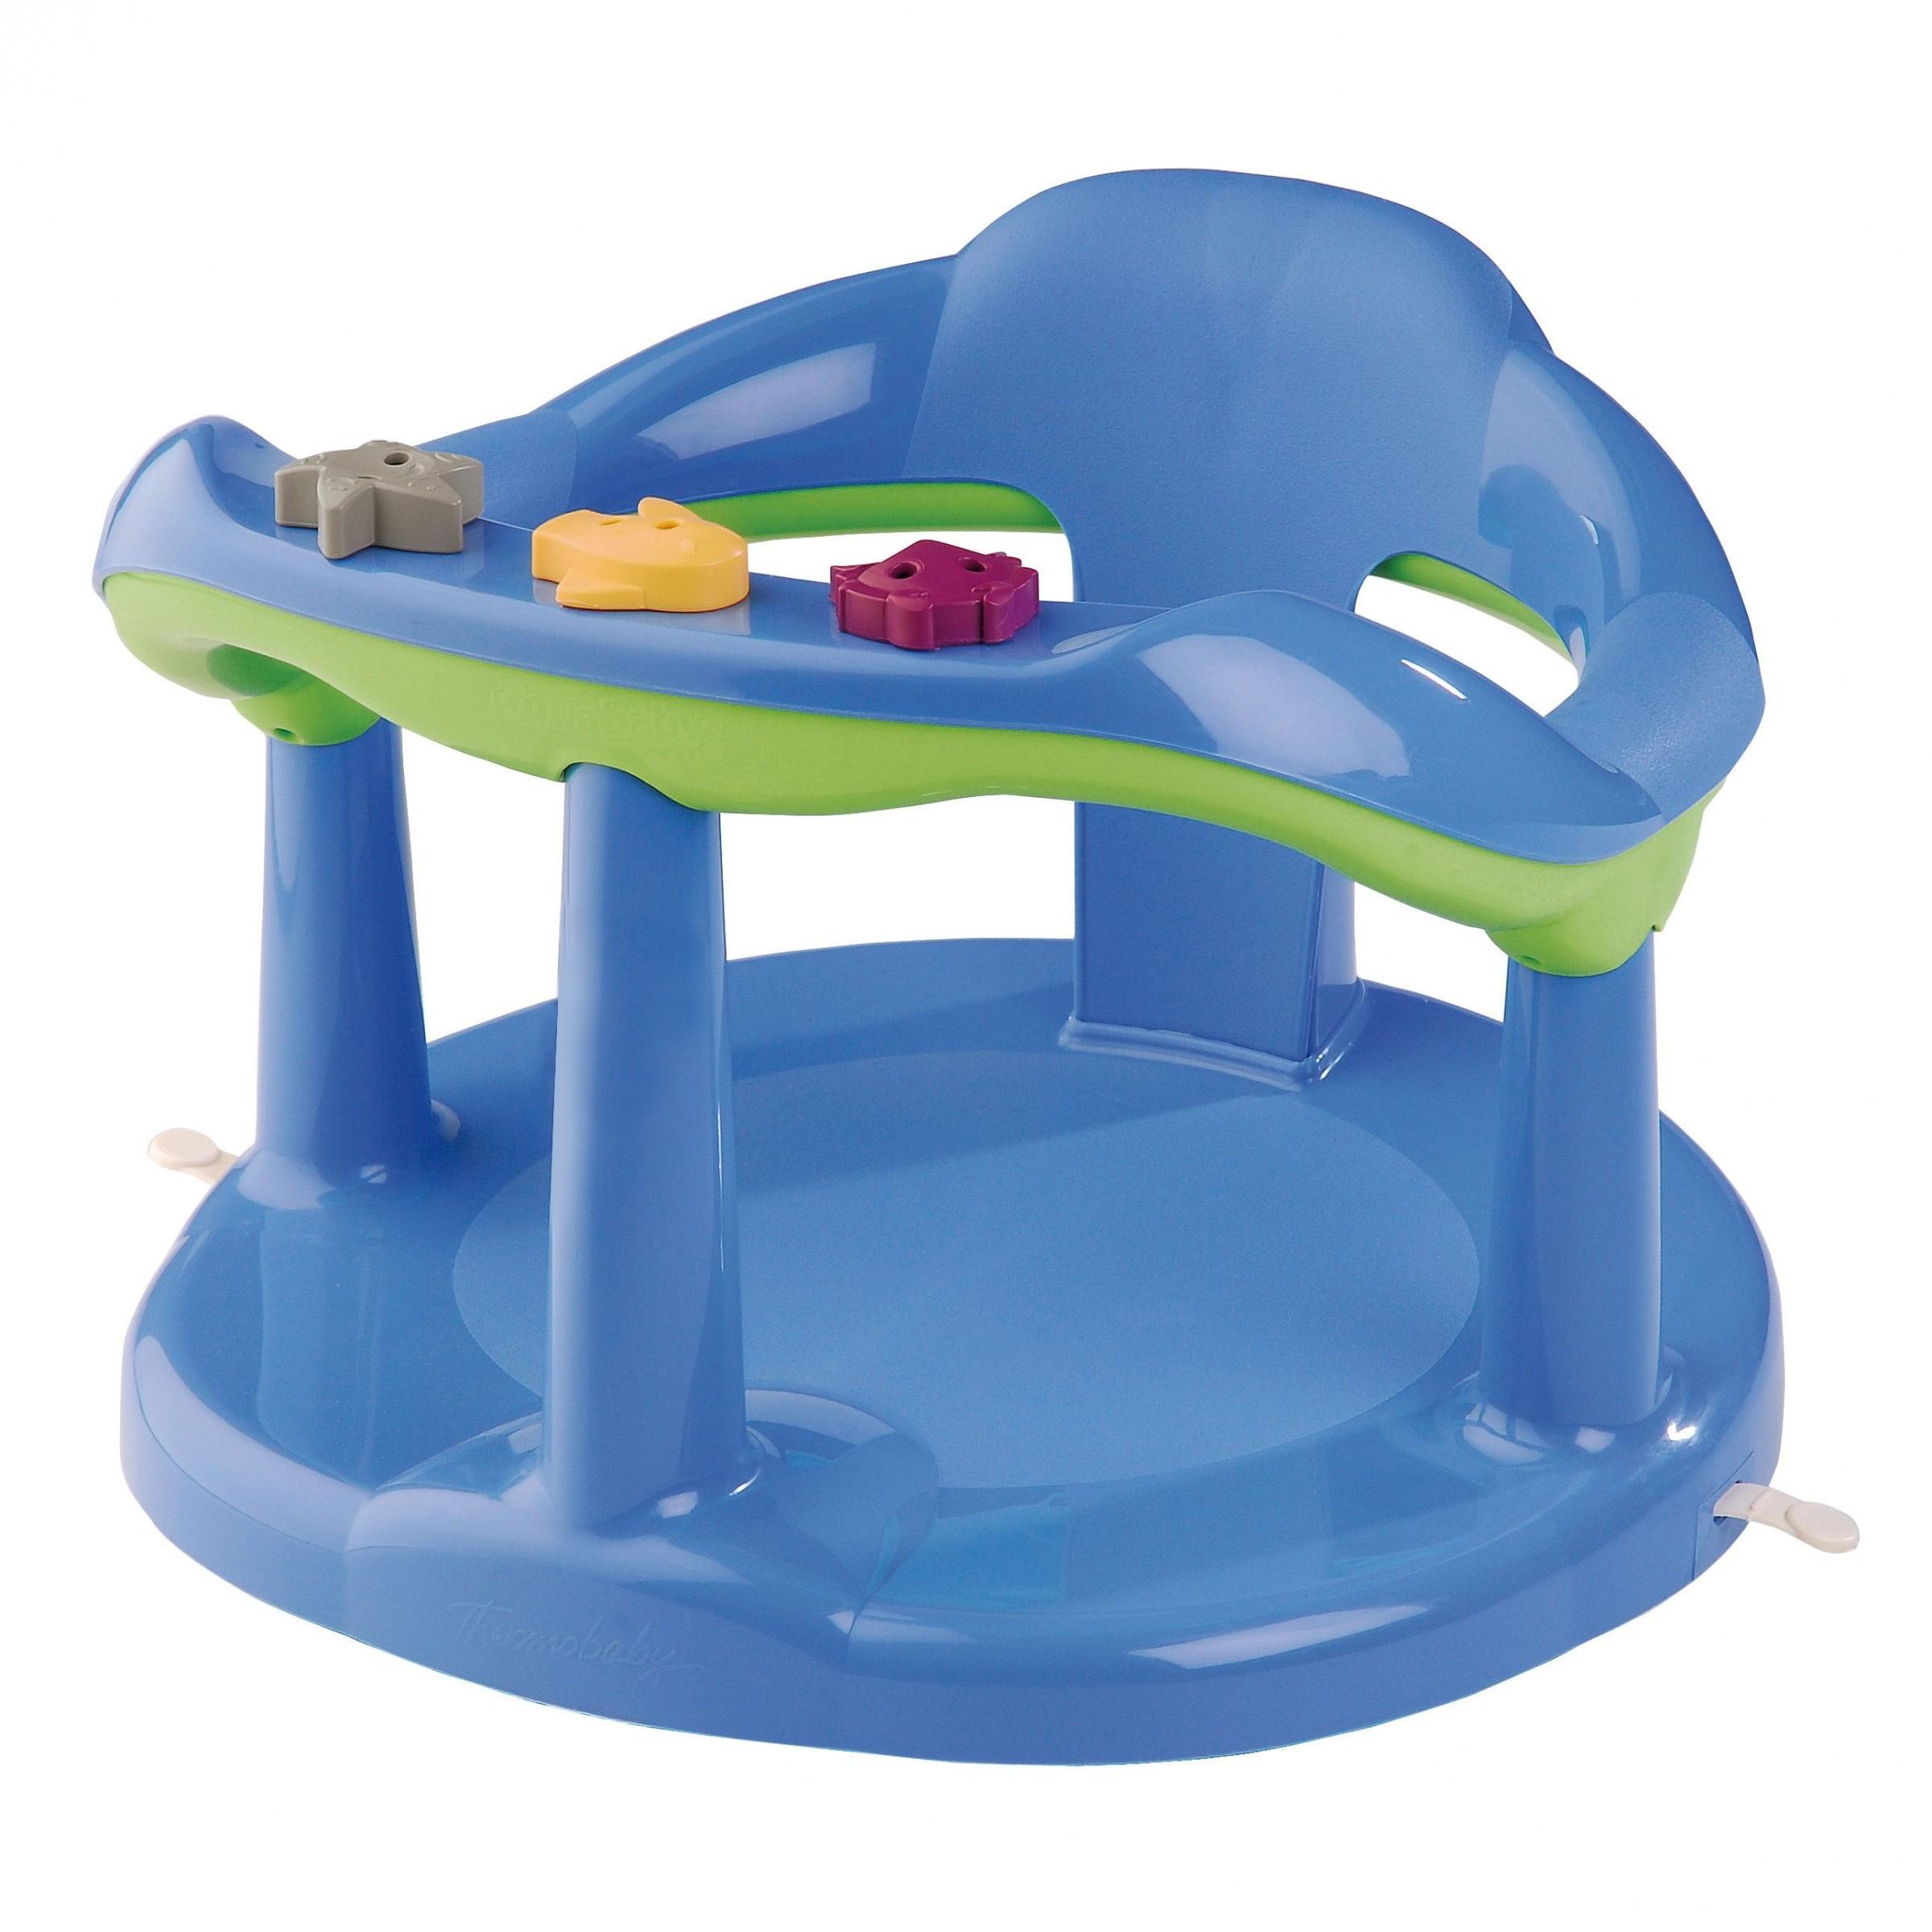 Funny Aquababy-Badering blau/grün 2825